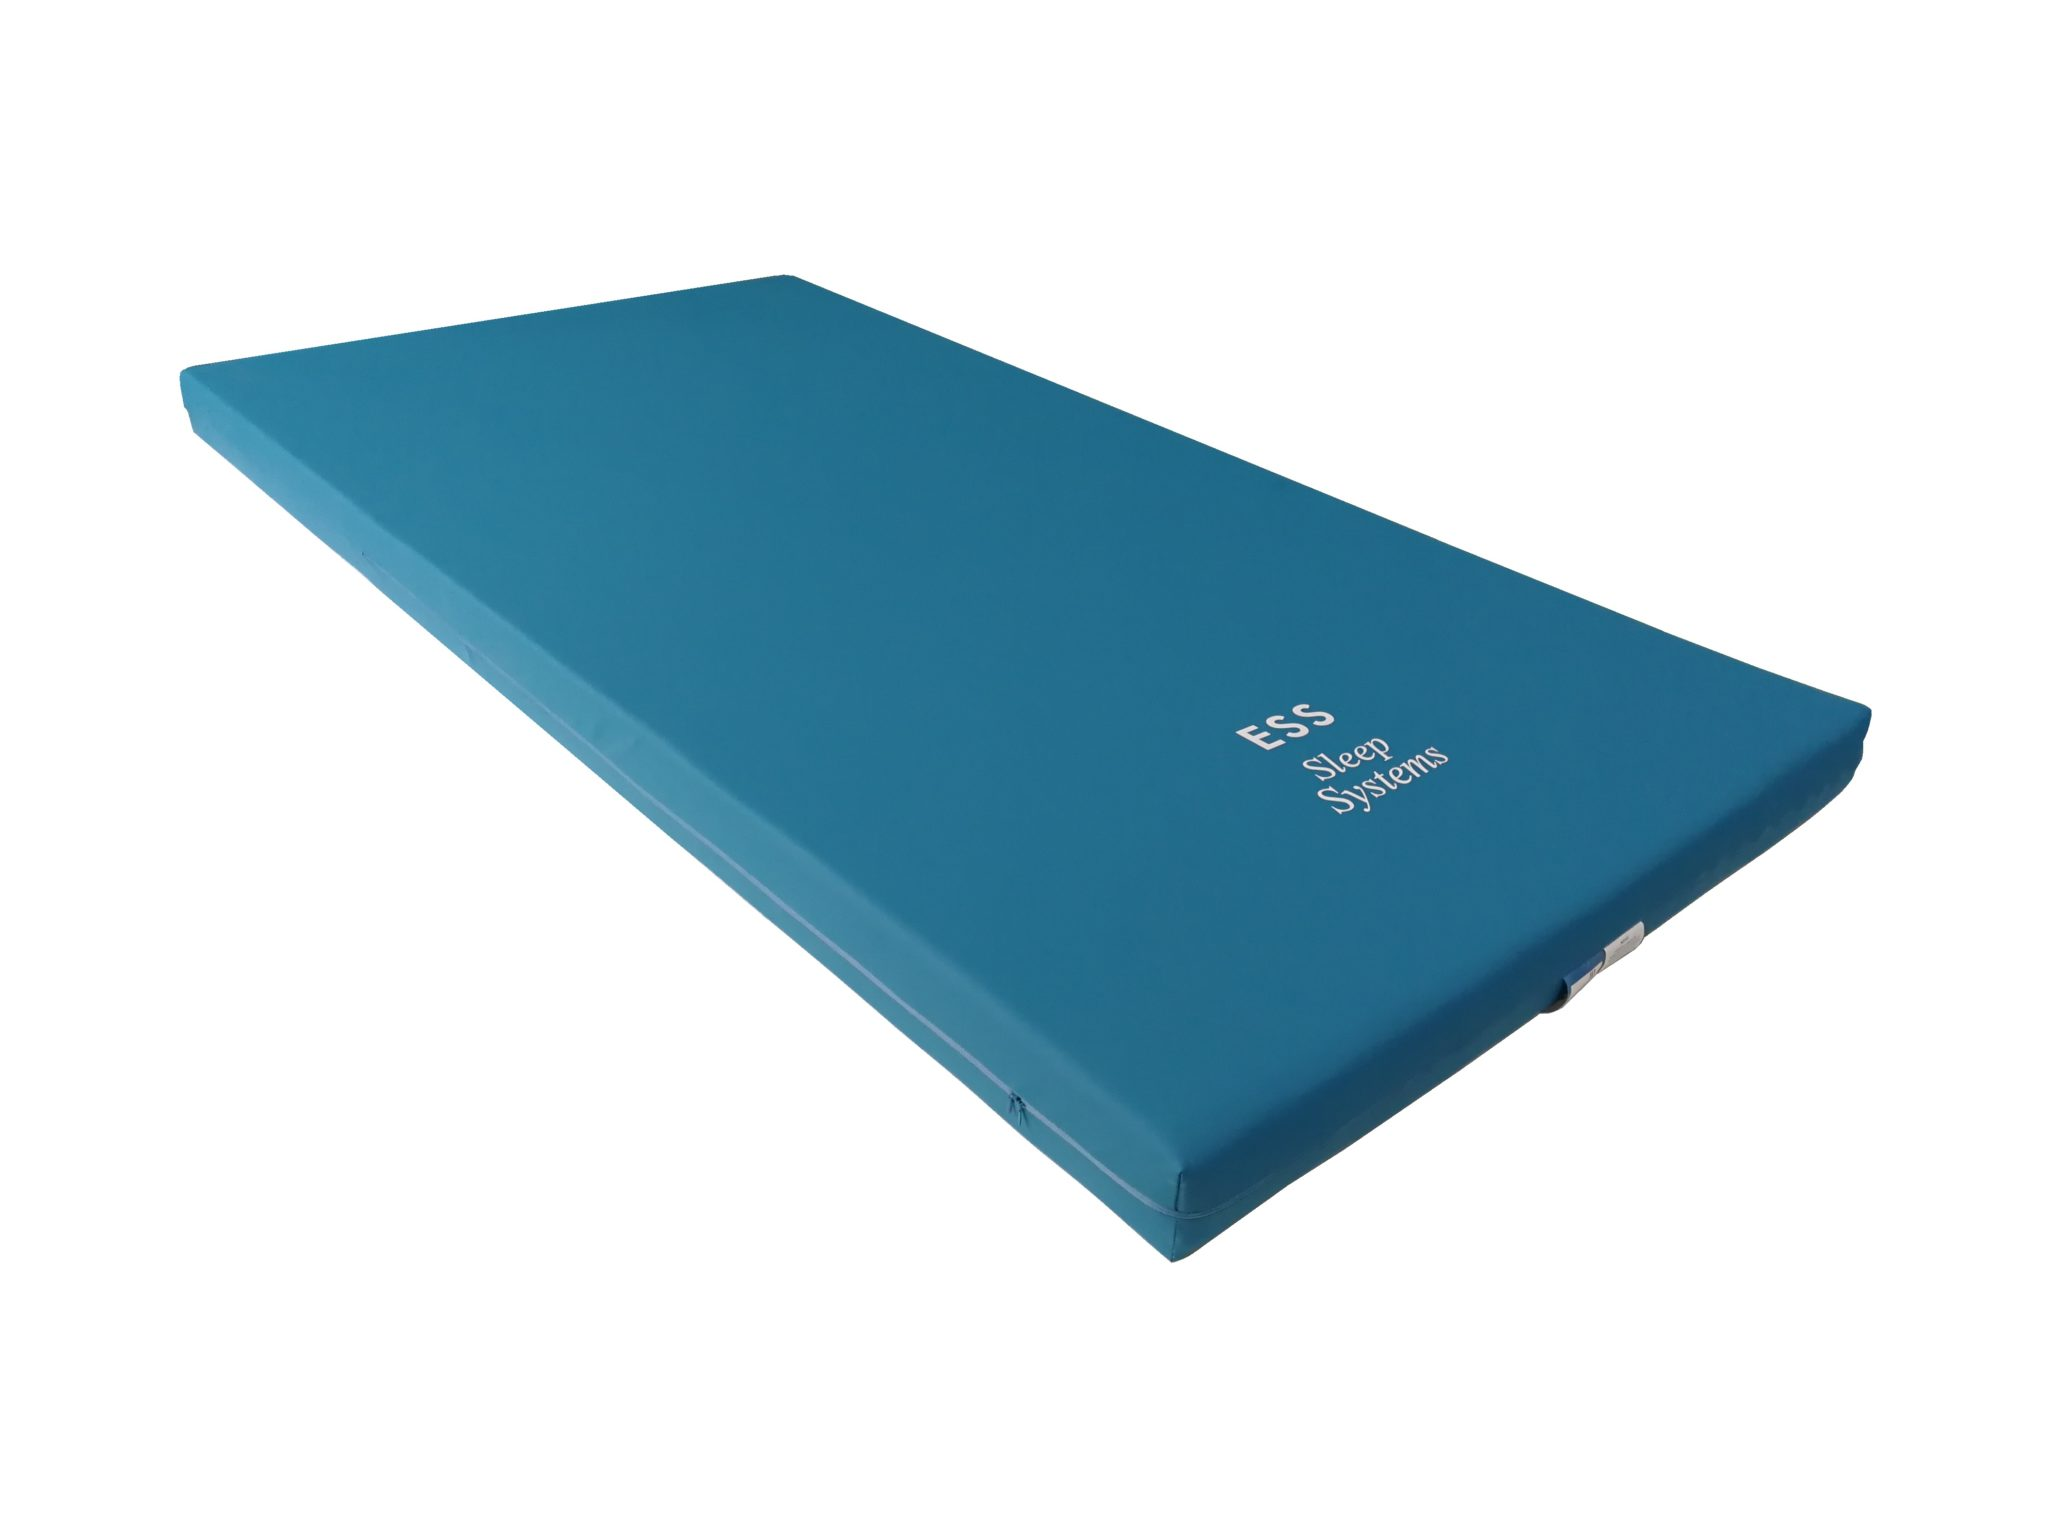 bed bug resistant waterproof foam mattress